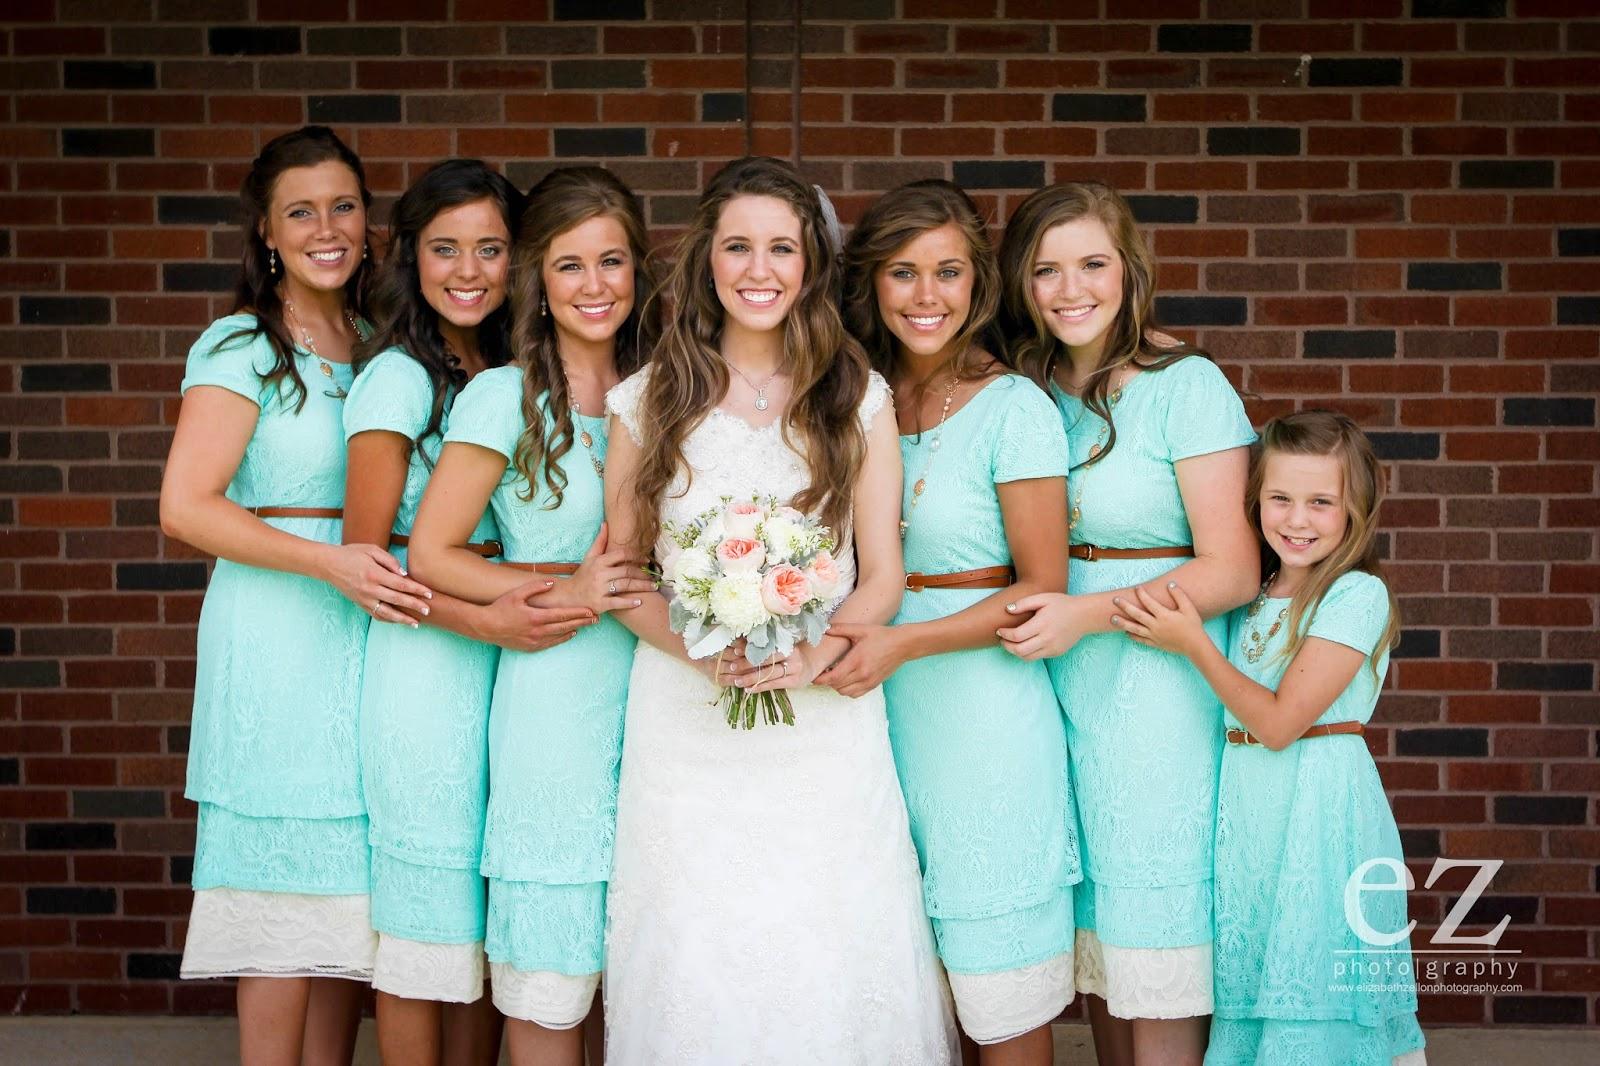 Dillards Dresses Wedding 40 Amazing Photos Elizabeth Zellon Photography